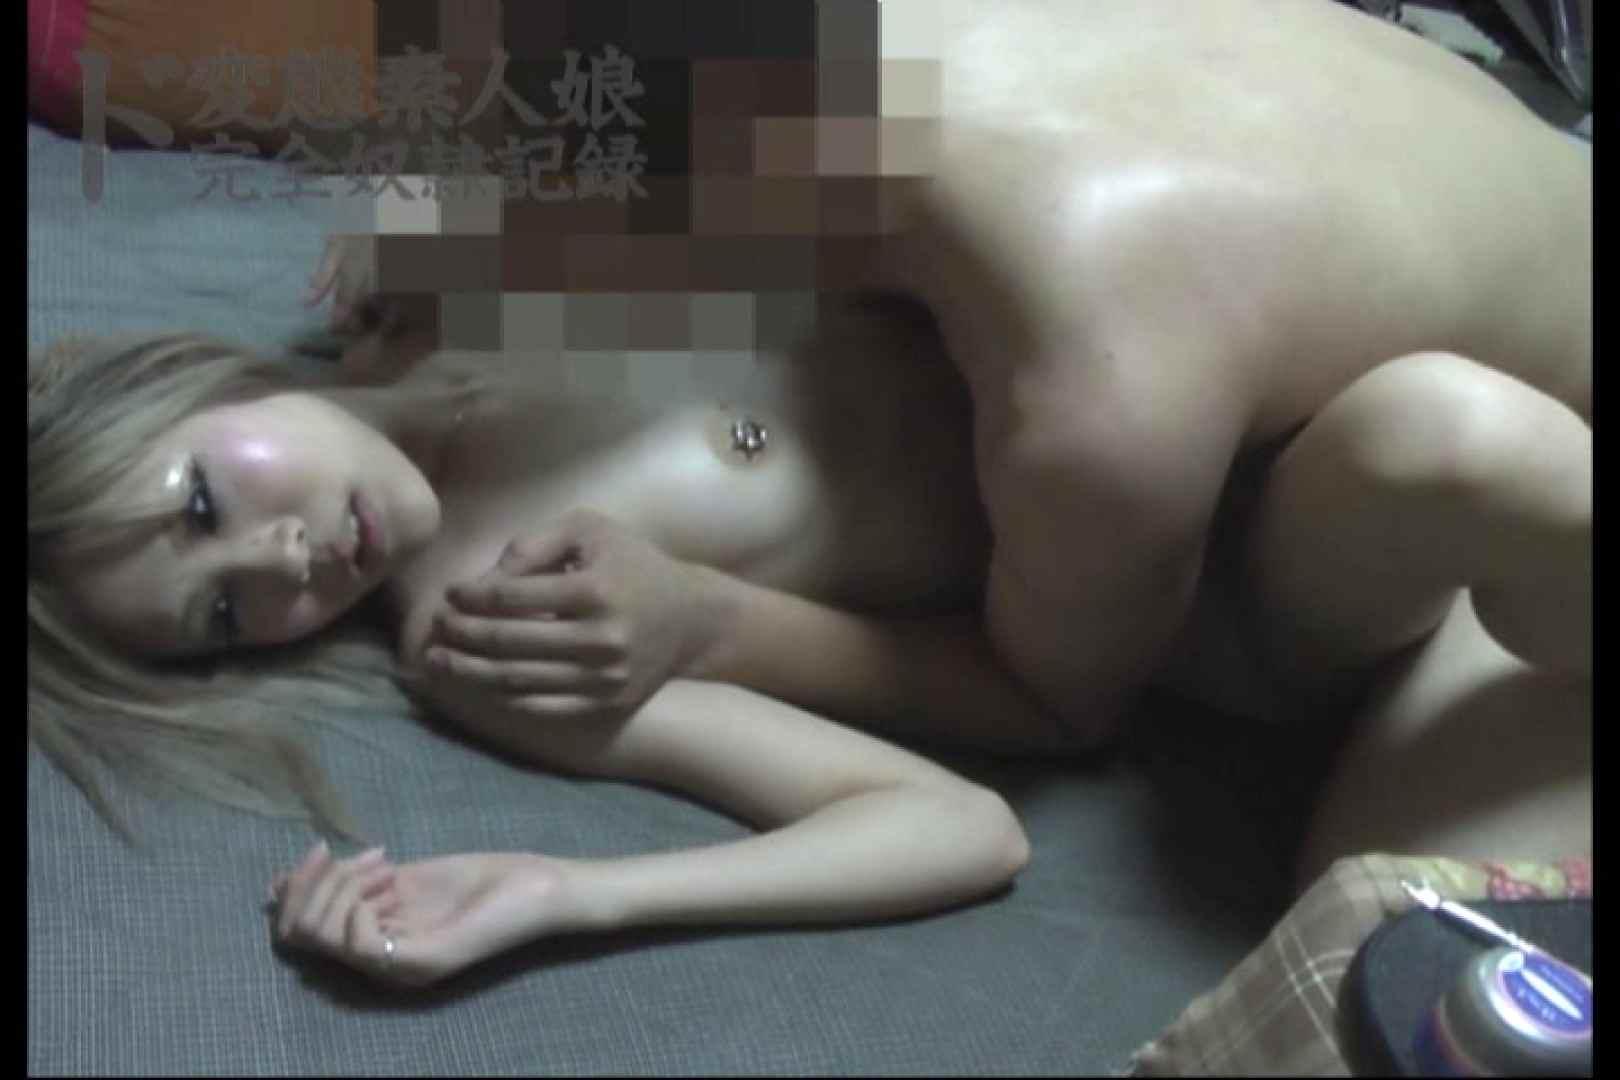 ド変態素人嬢完全奴隷記録 ~其の陸~後編 素人流出動画 | 中出し  79枚 67